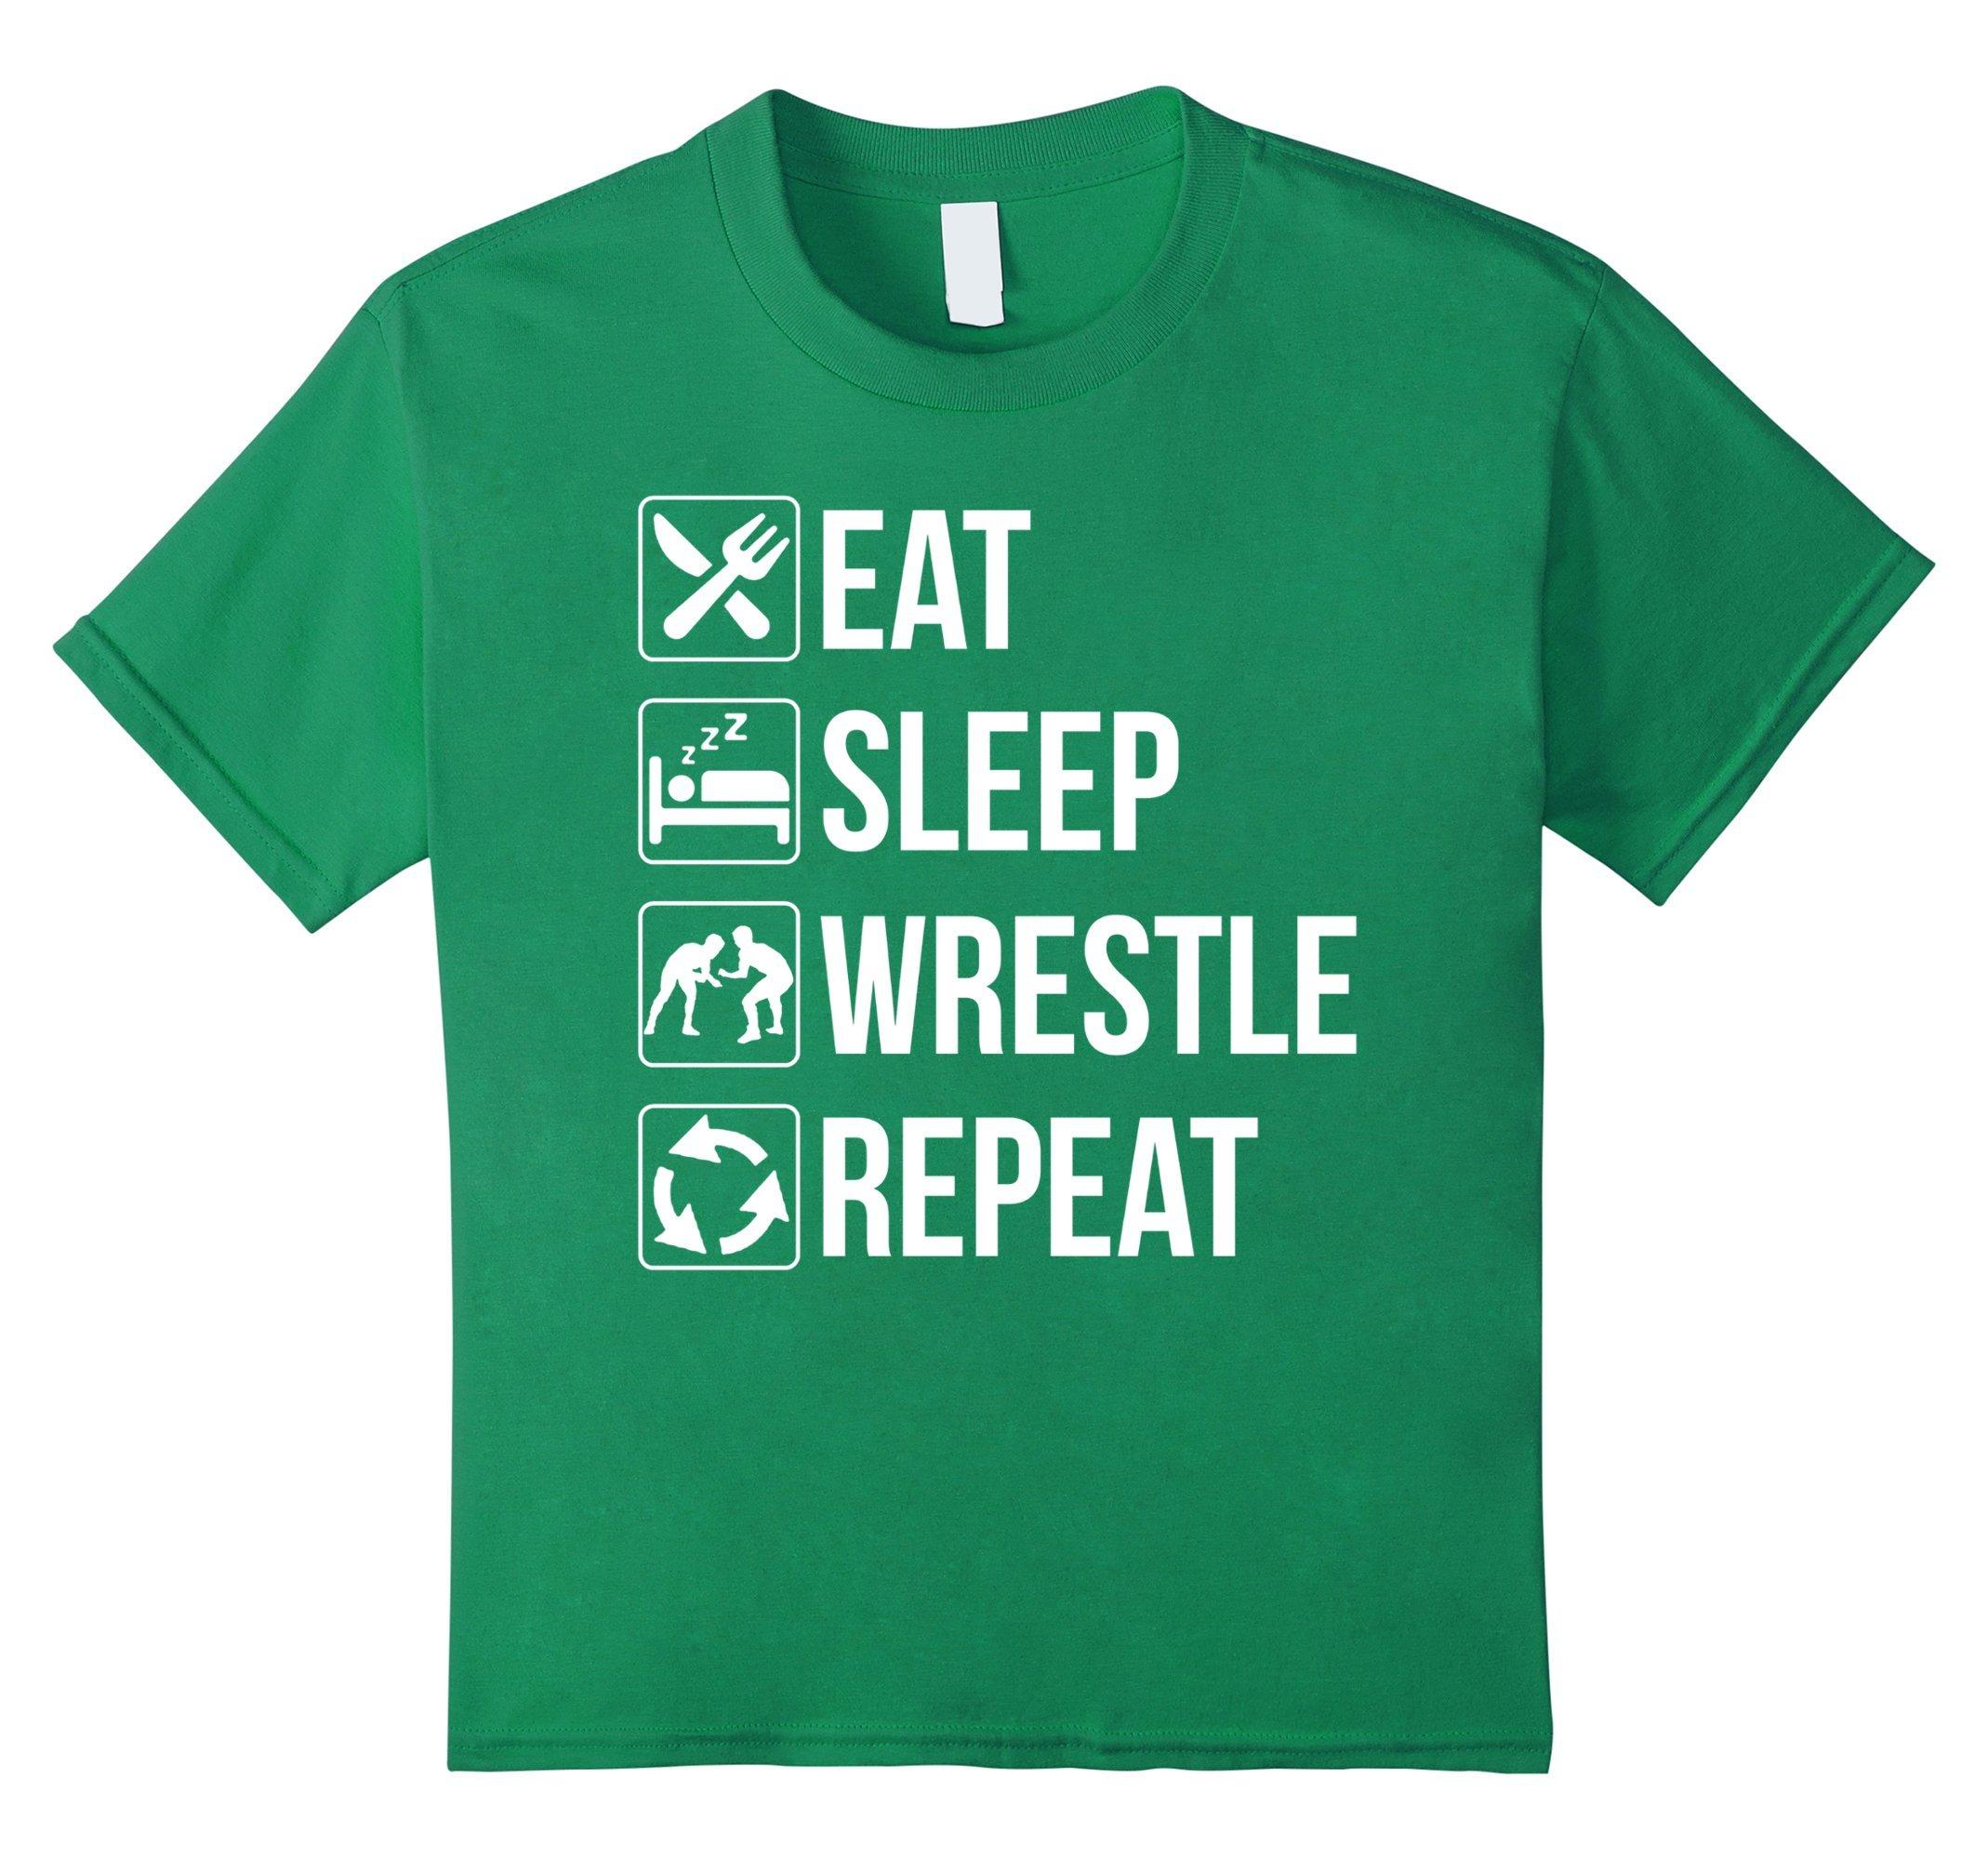 Kids Funny Eat Sleep Wrestle Repeat Wrestling TShirt 12 Kelly Green by Eat Sleep Repeat Shirt Store